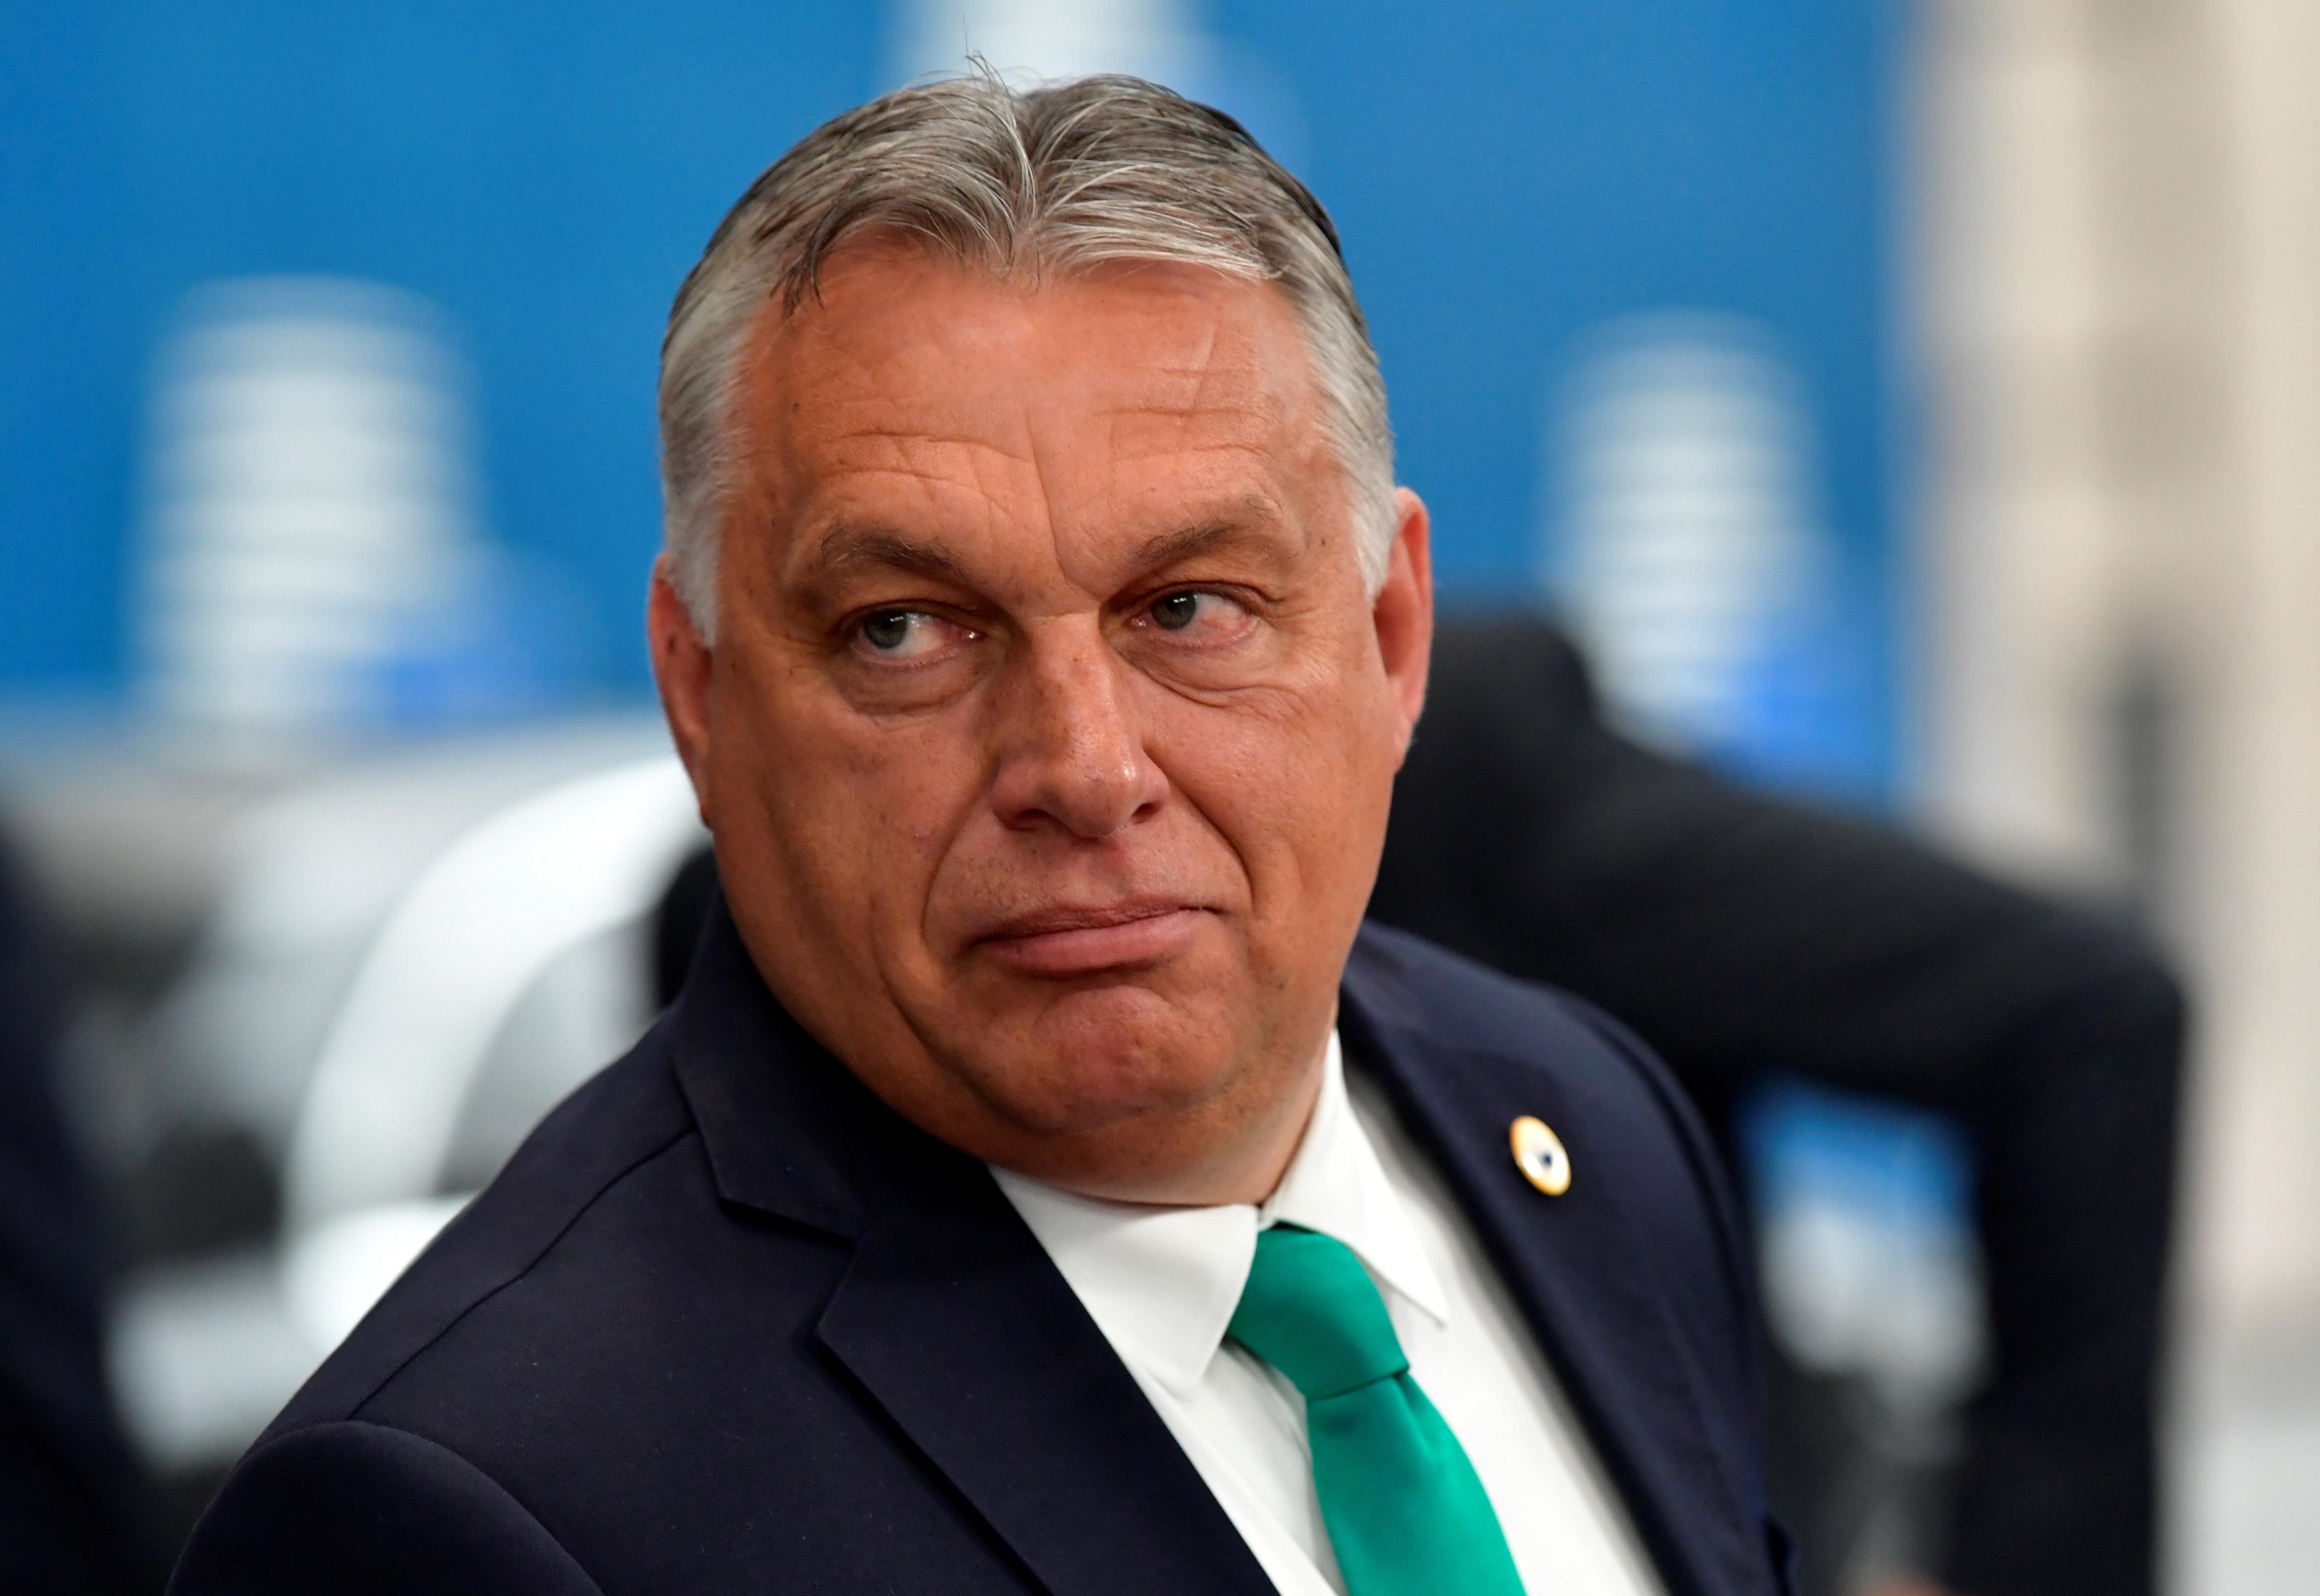 EU leaders fail to break impasse on $2.1 trillion budget